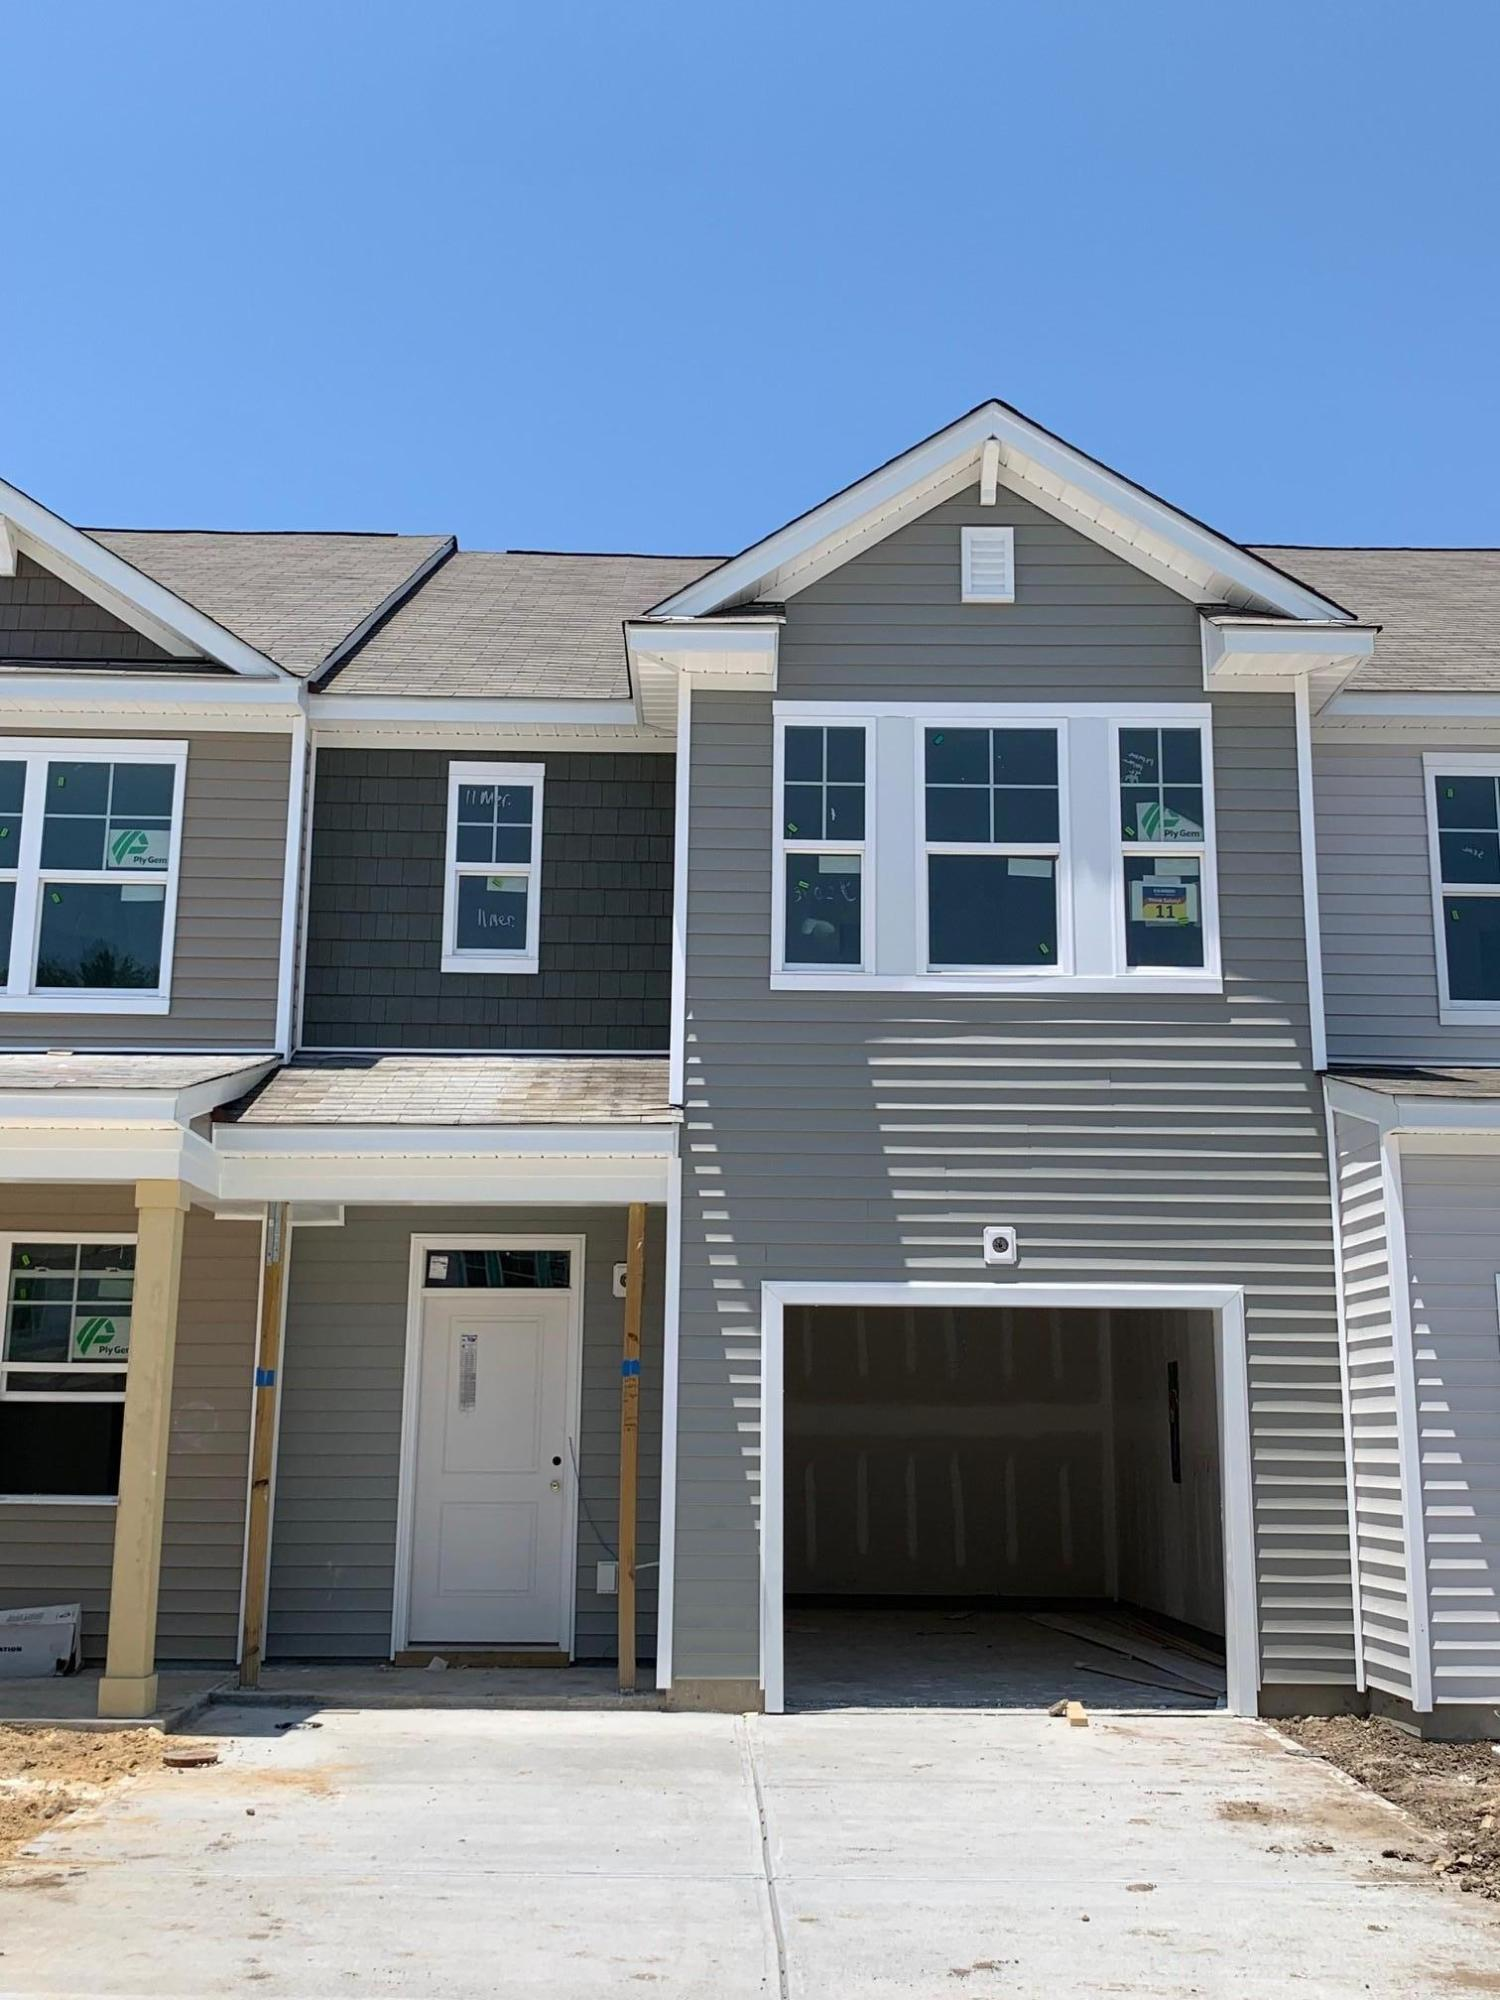 Cane Bay Plantation Homes For Sale - 625 Hilchot, Summerville, SC - 16